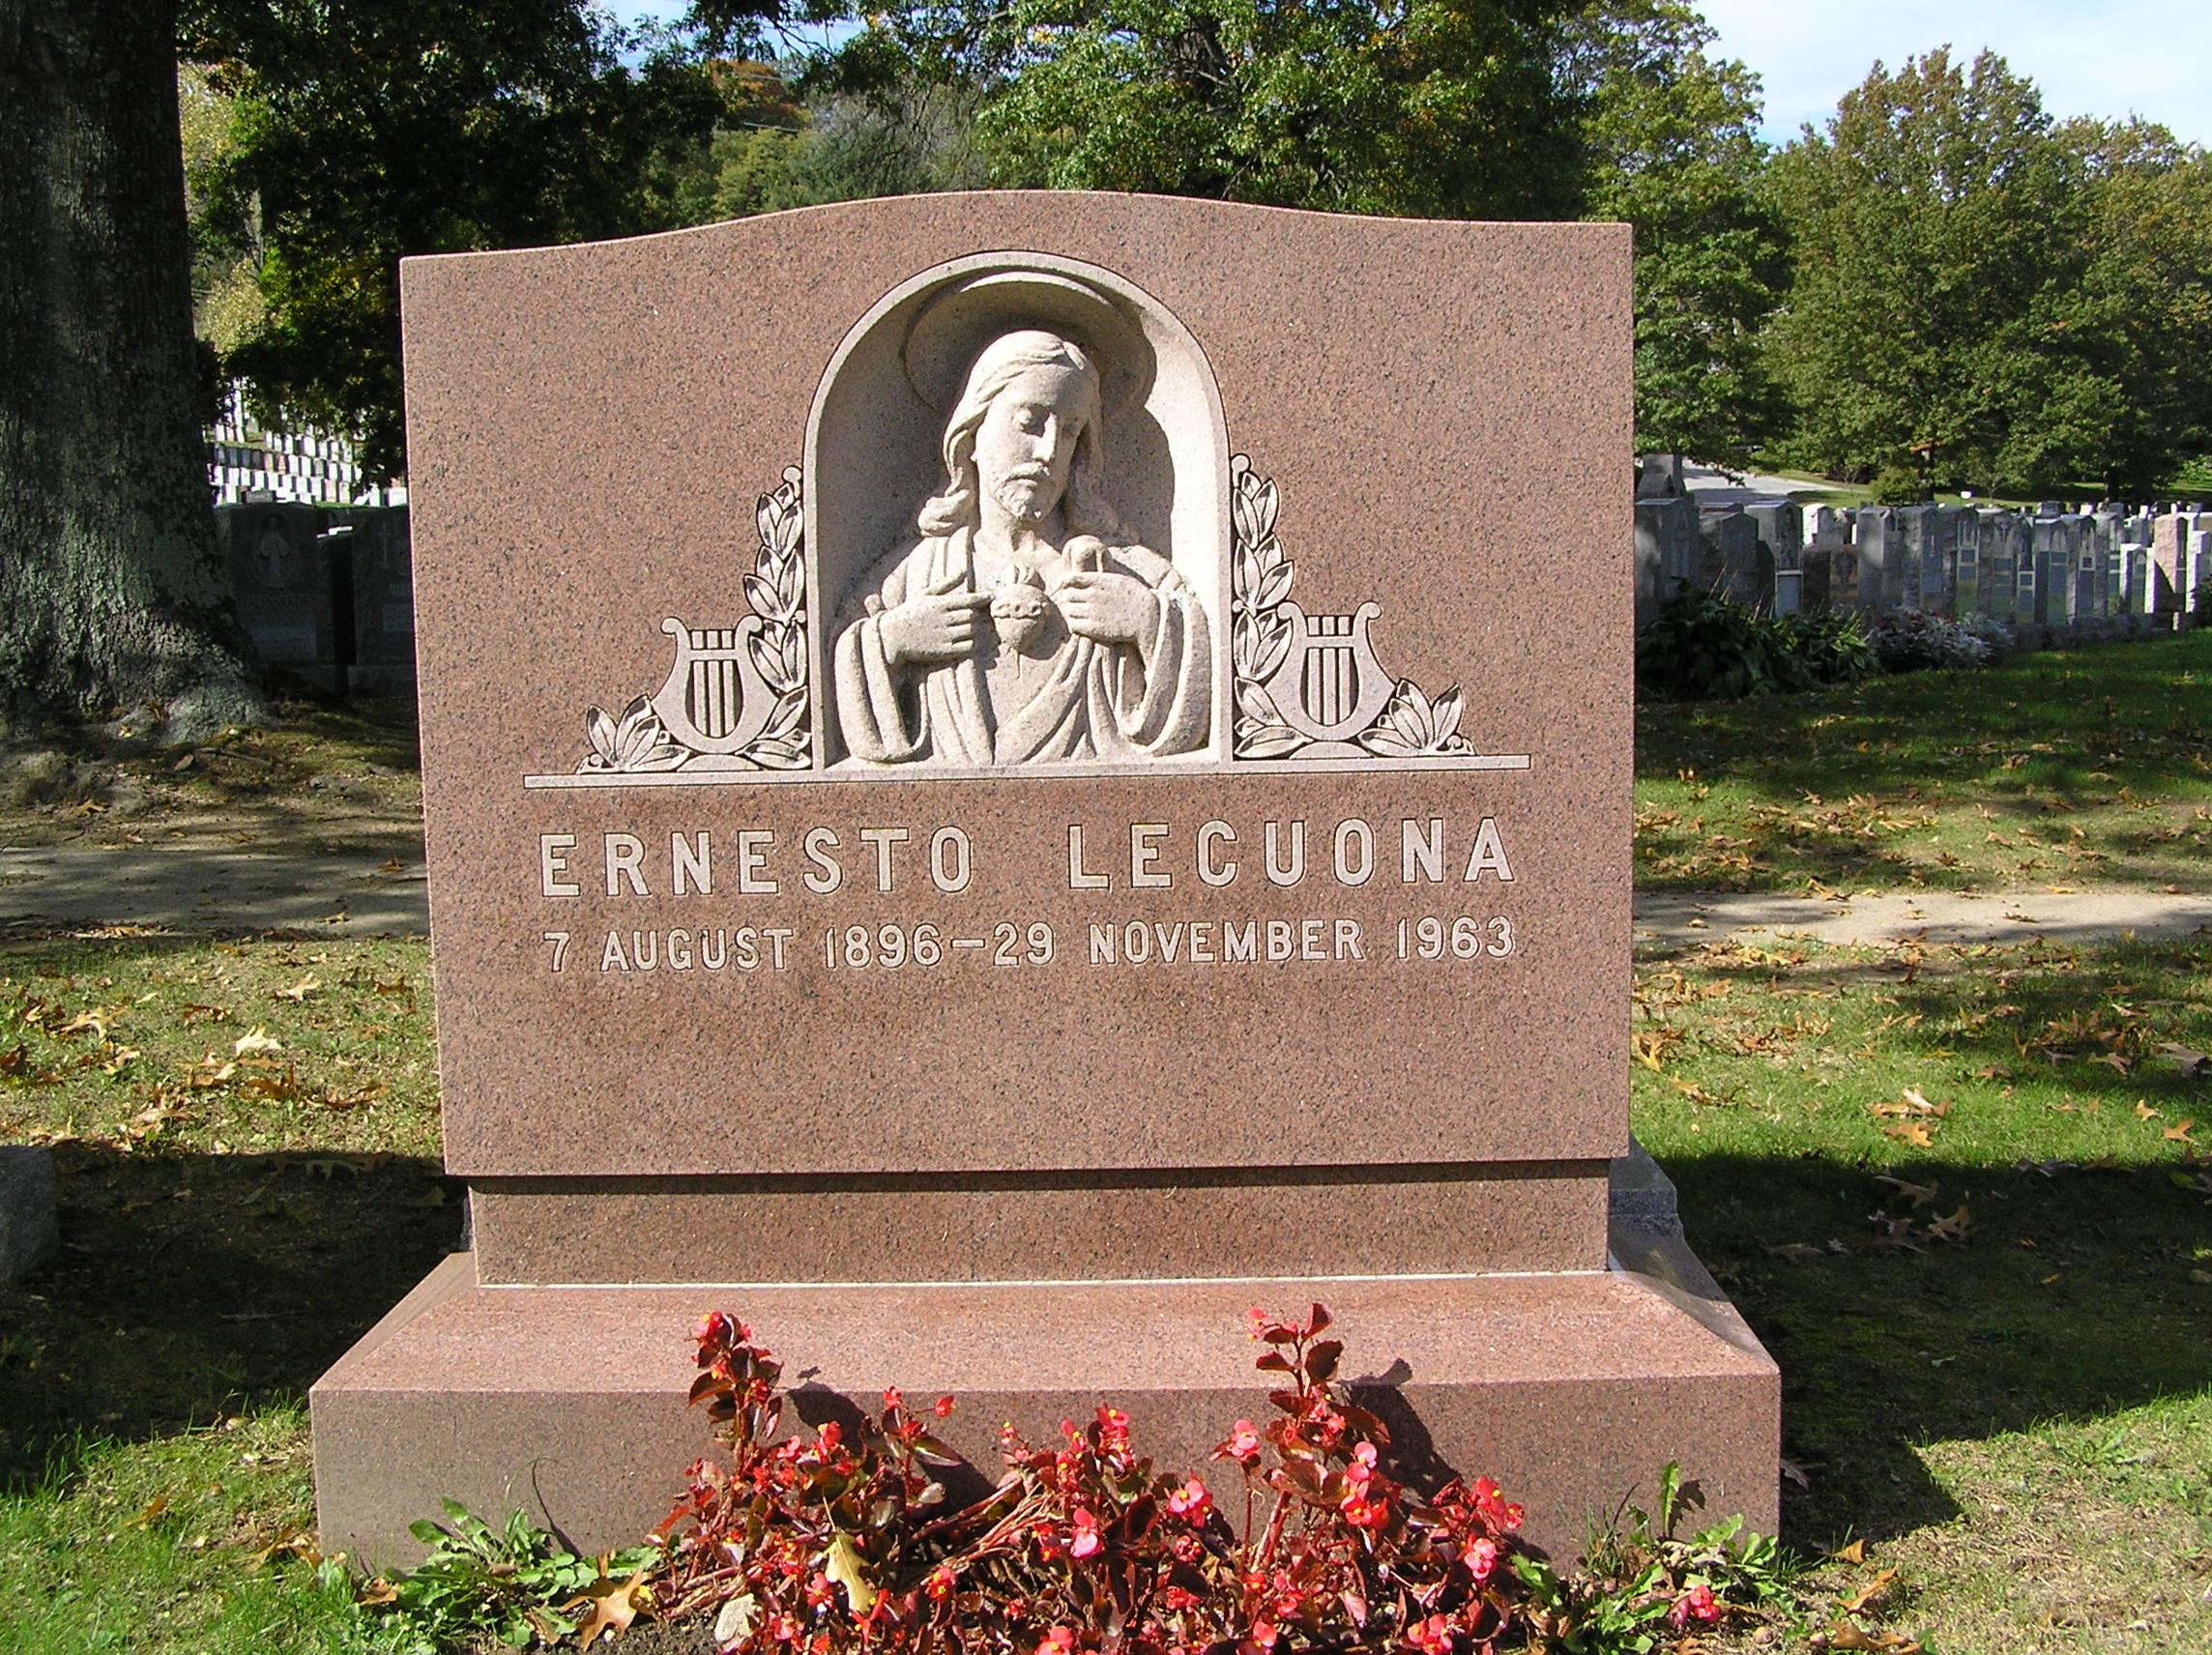 Tumba de Ernesto Lecuona en Nueva York.